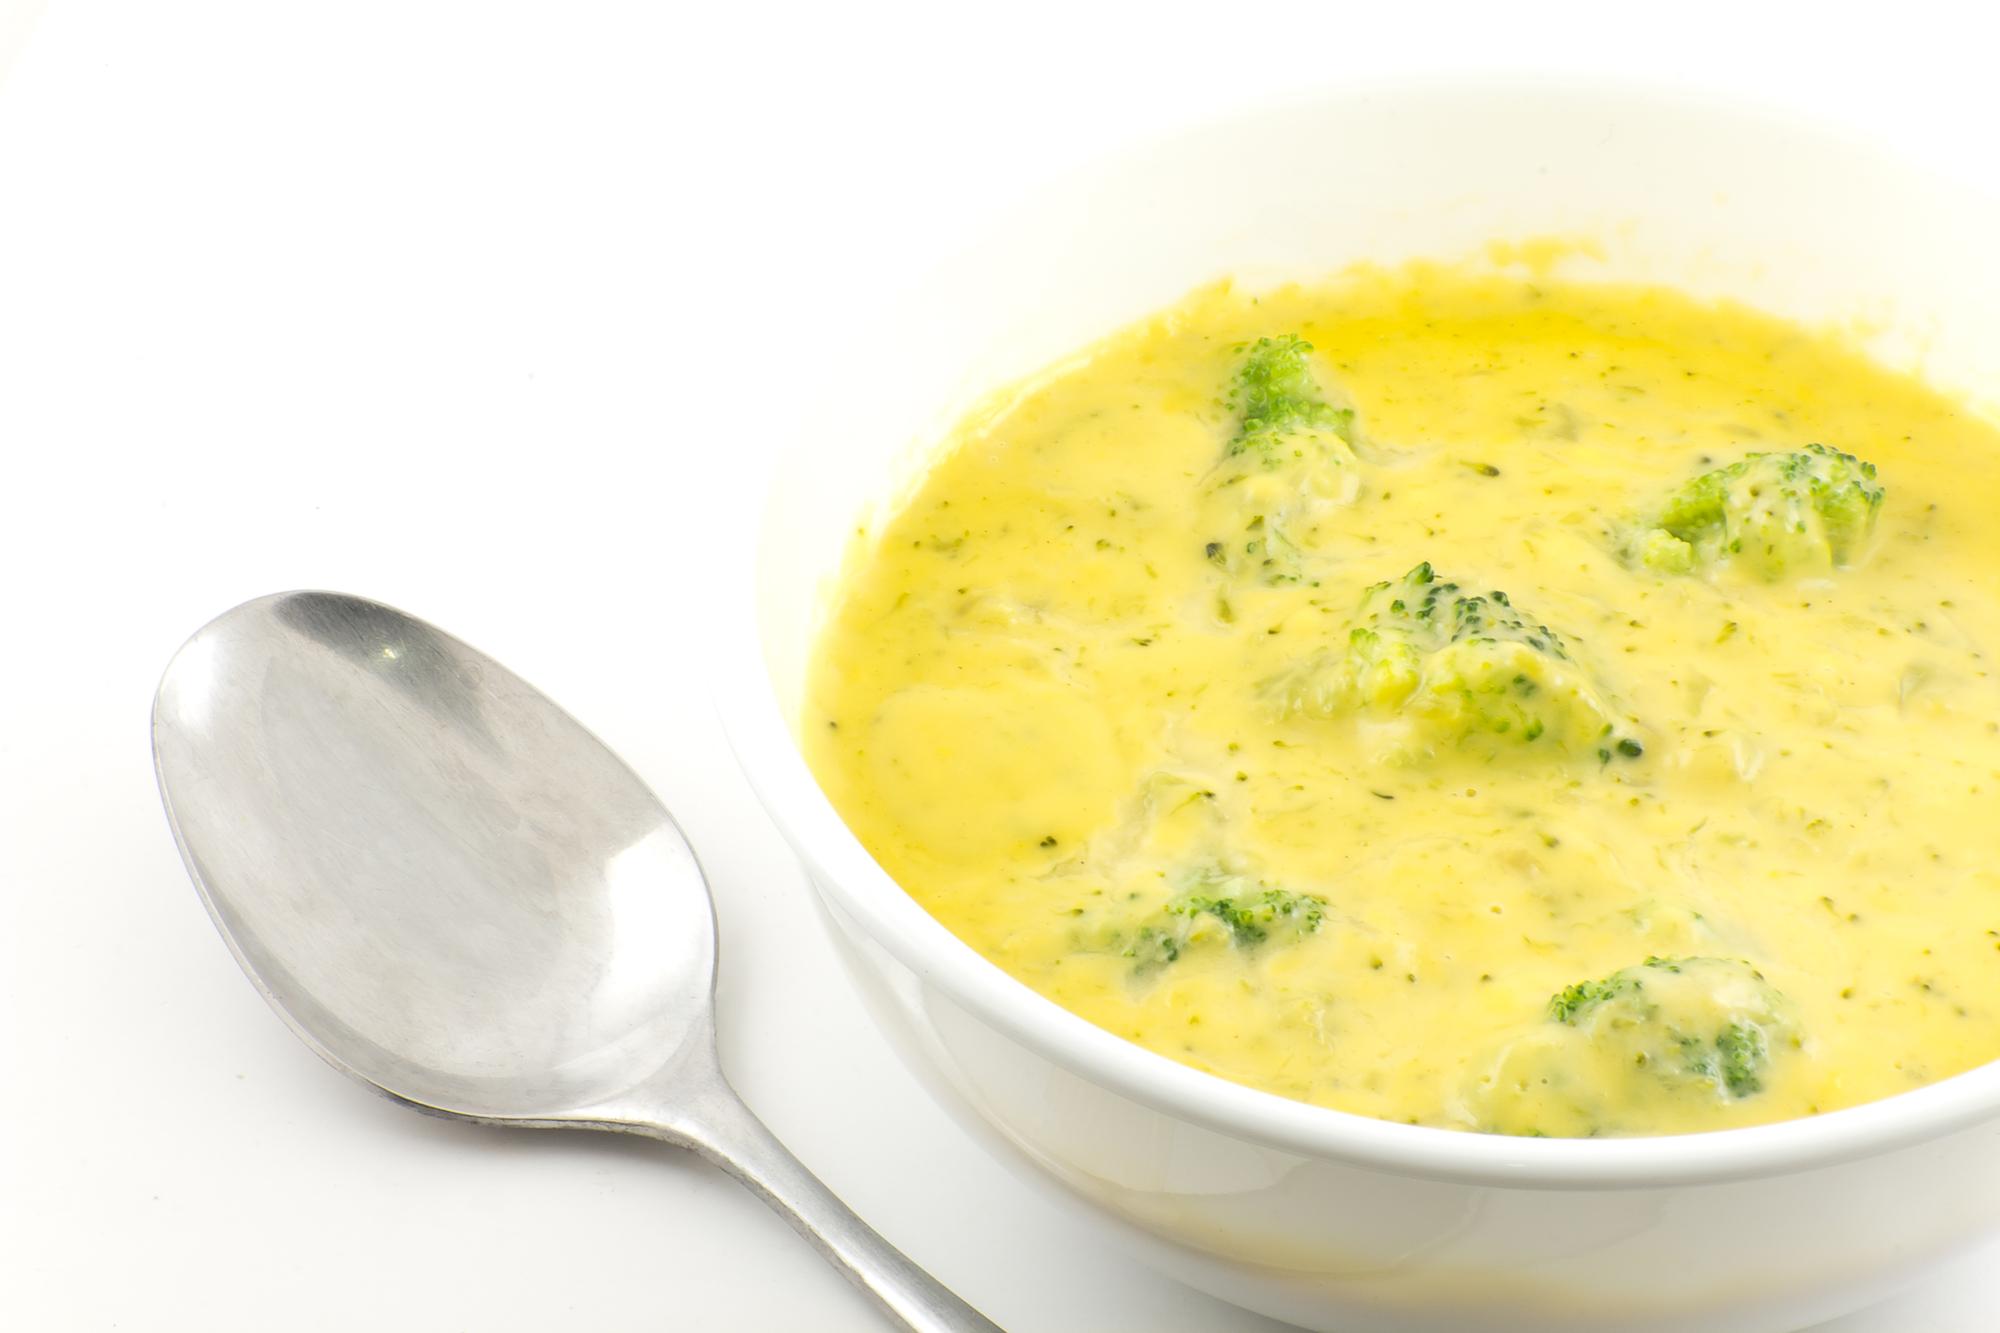 Keto Broccoli & Cheese Soup